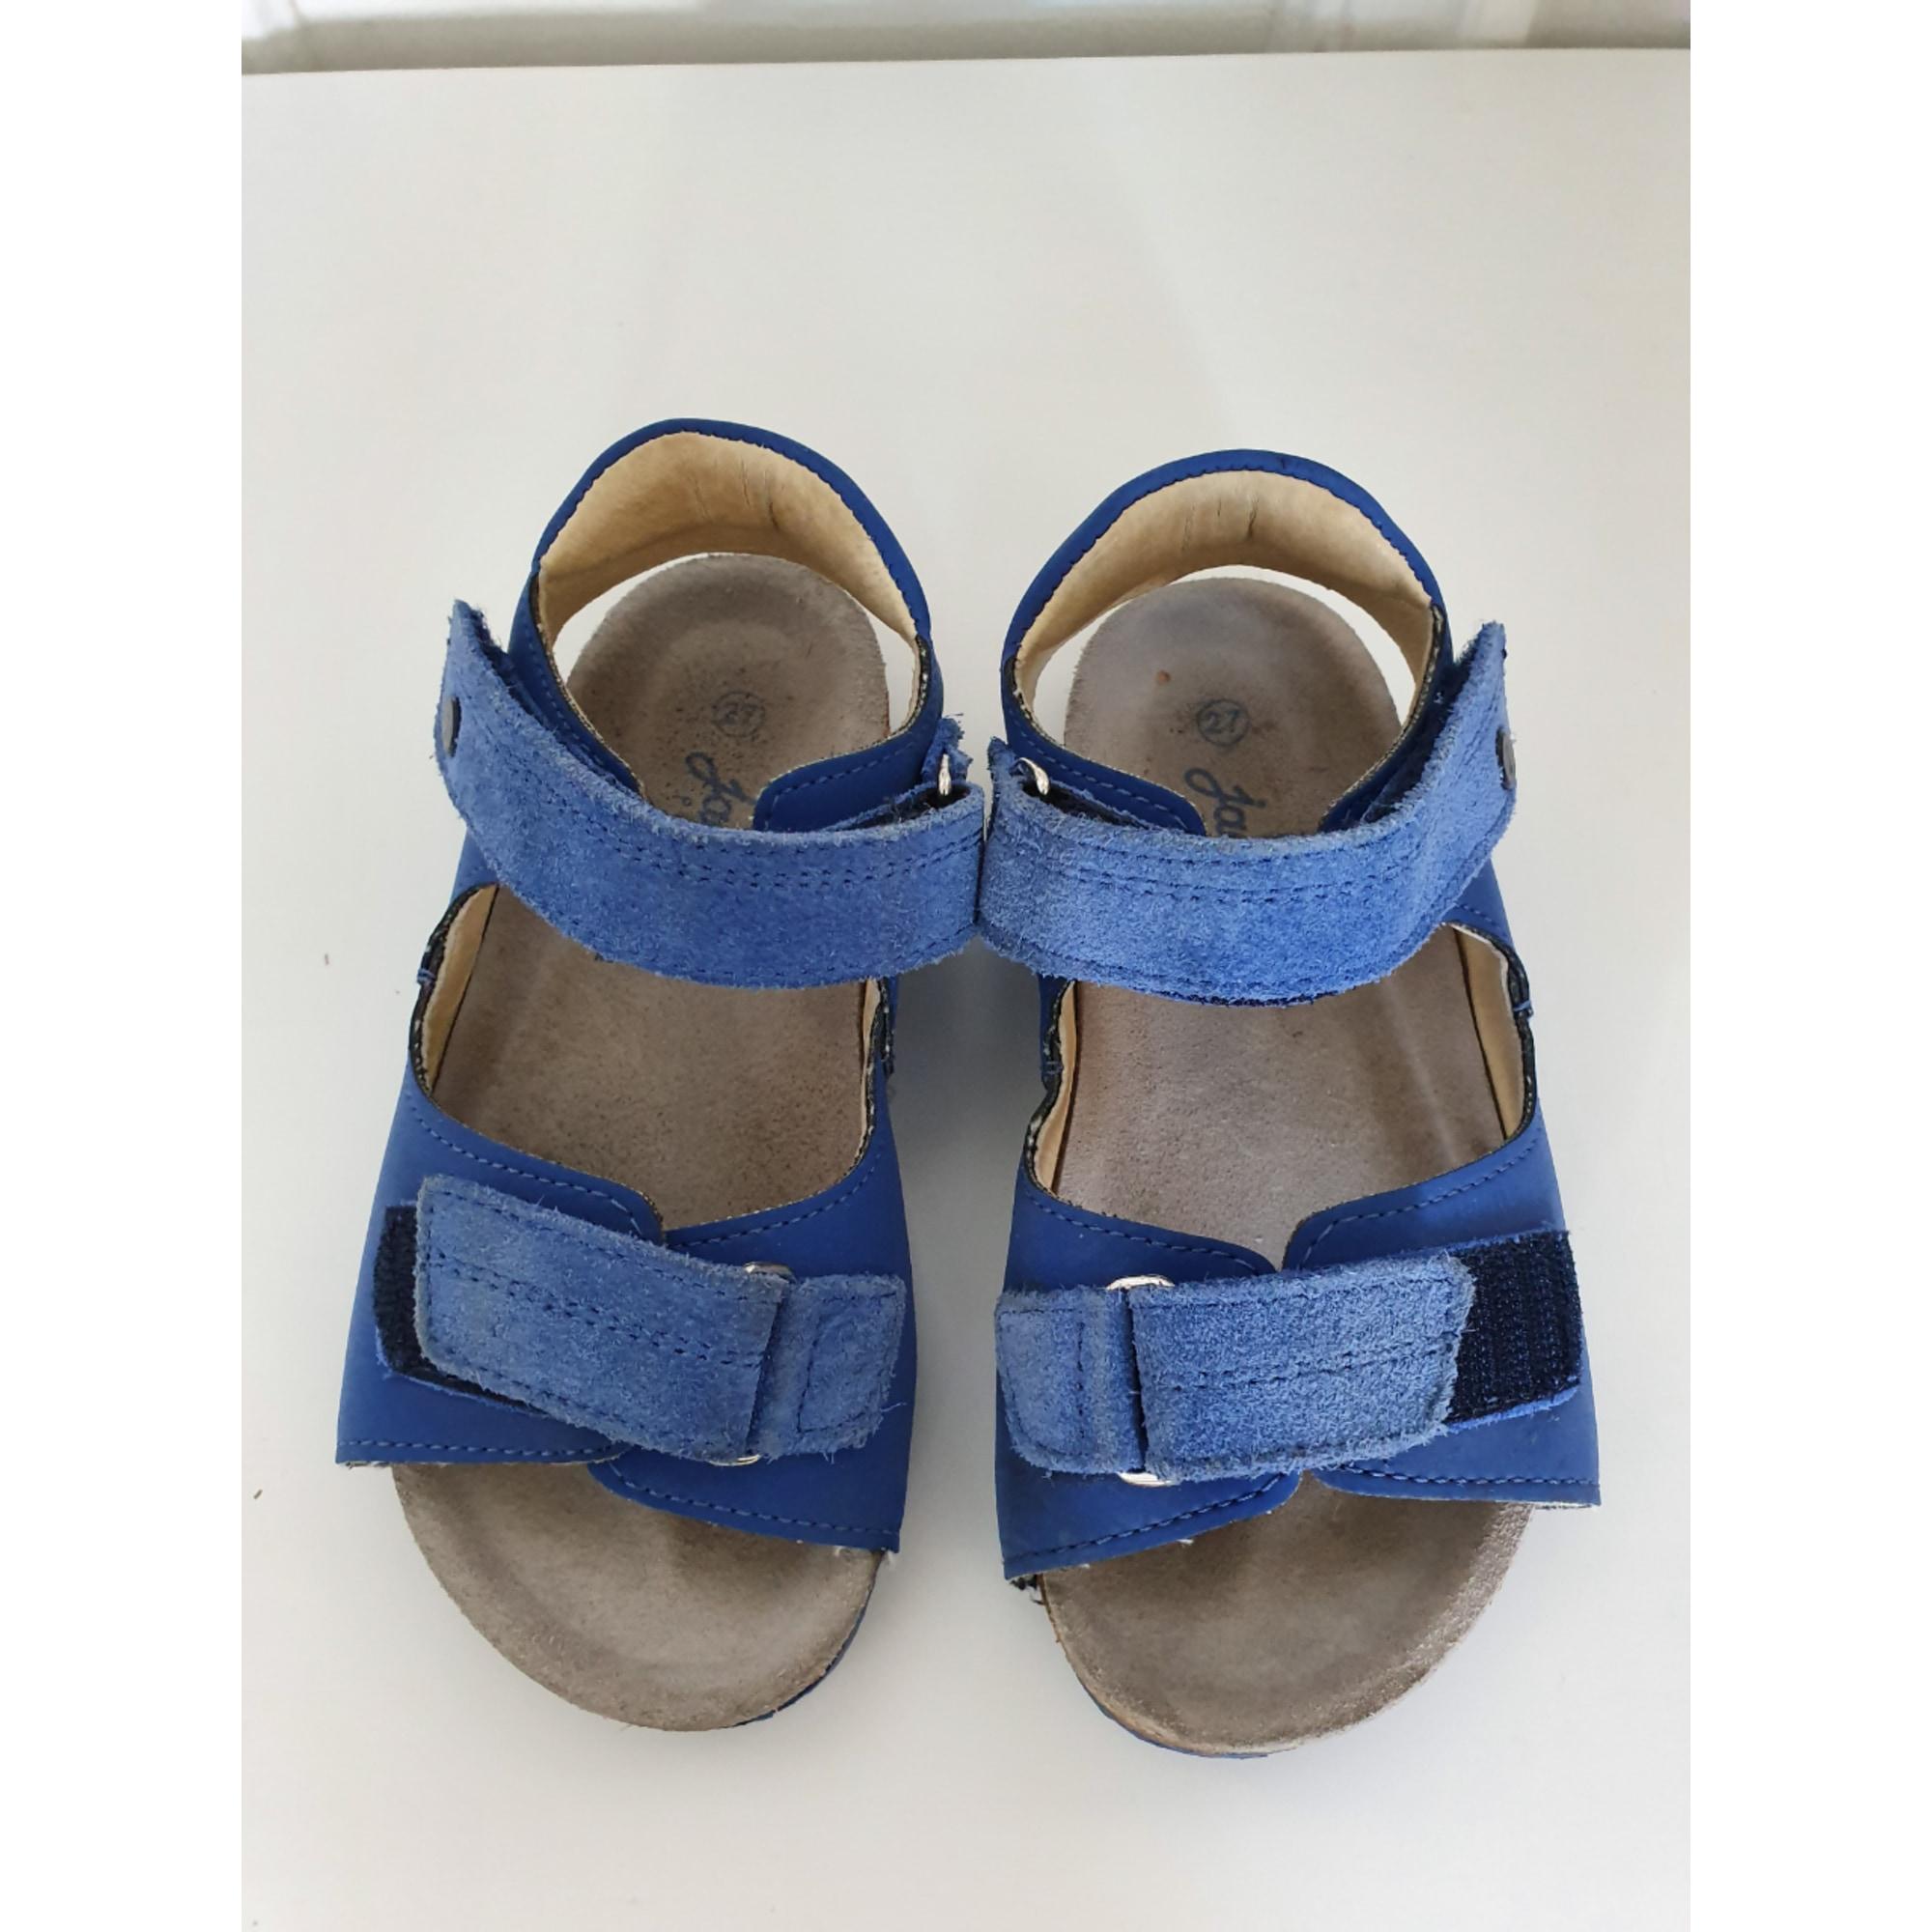 Sandales JACADI Bleu, bleu marine, bleu turquoise